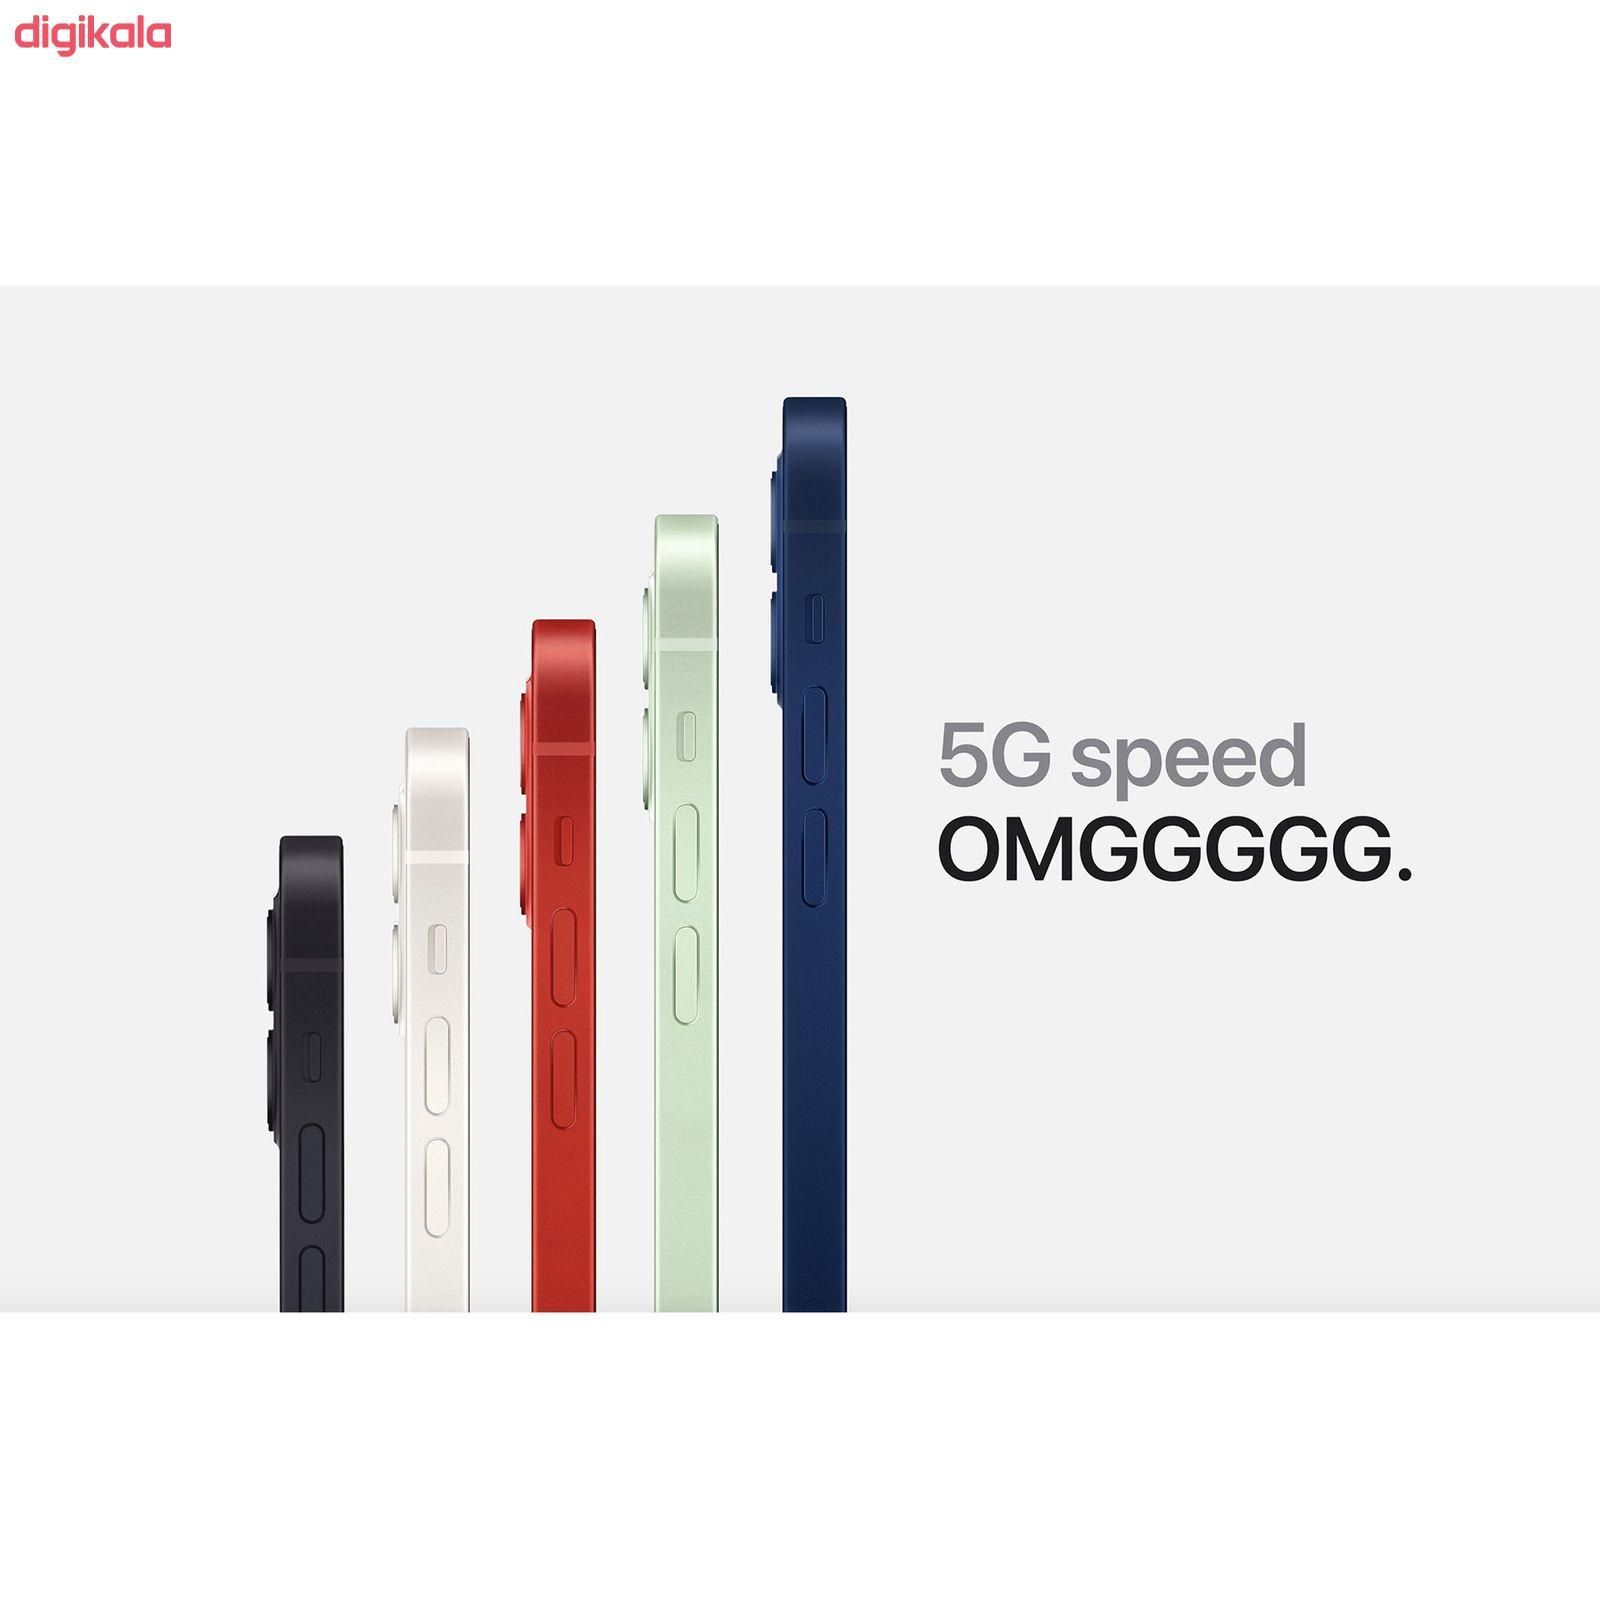 گوشی موبایل اپل مدل iPhone 12 A2404 دو سیم کارت ظرفیت 256 گیگابایت  main 1 7